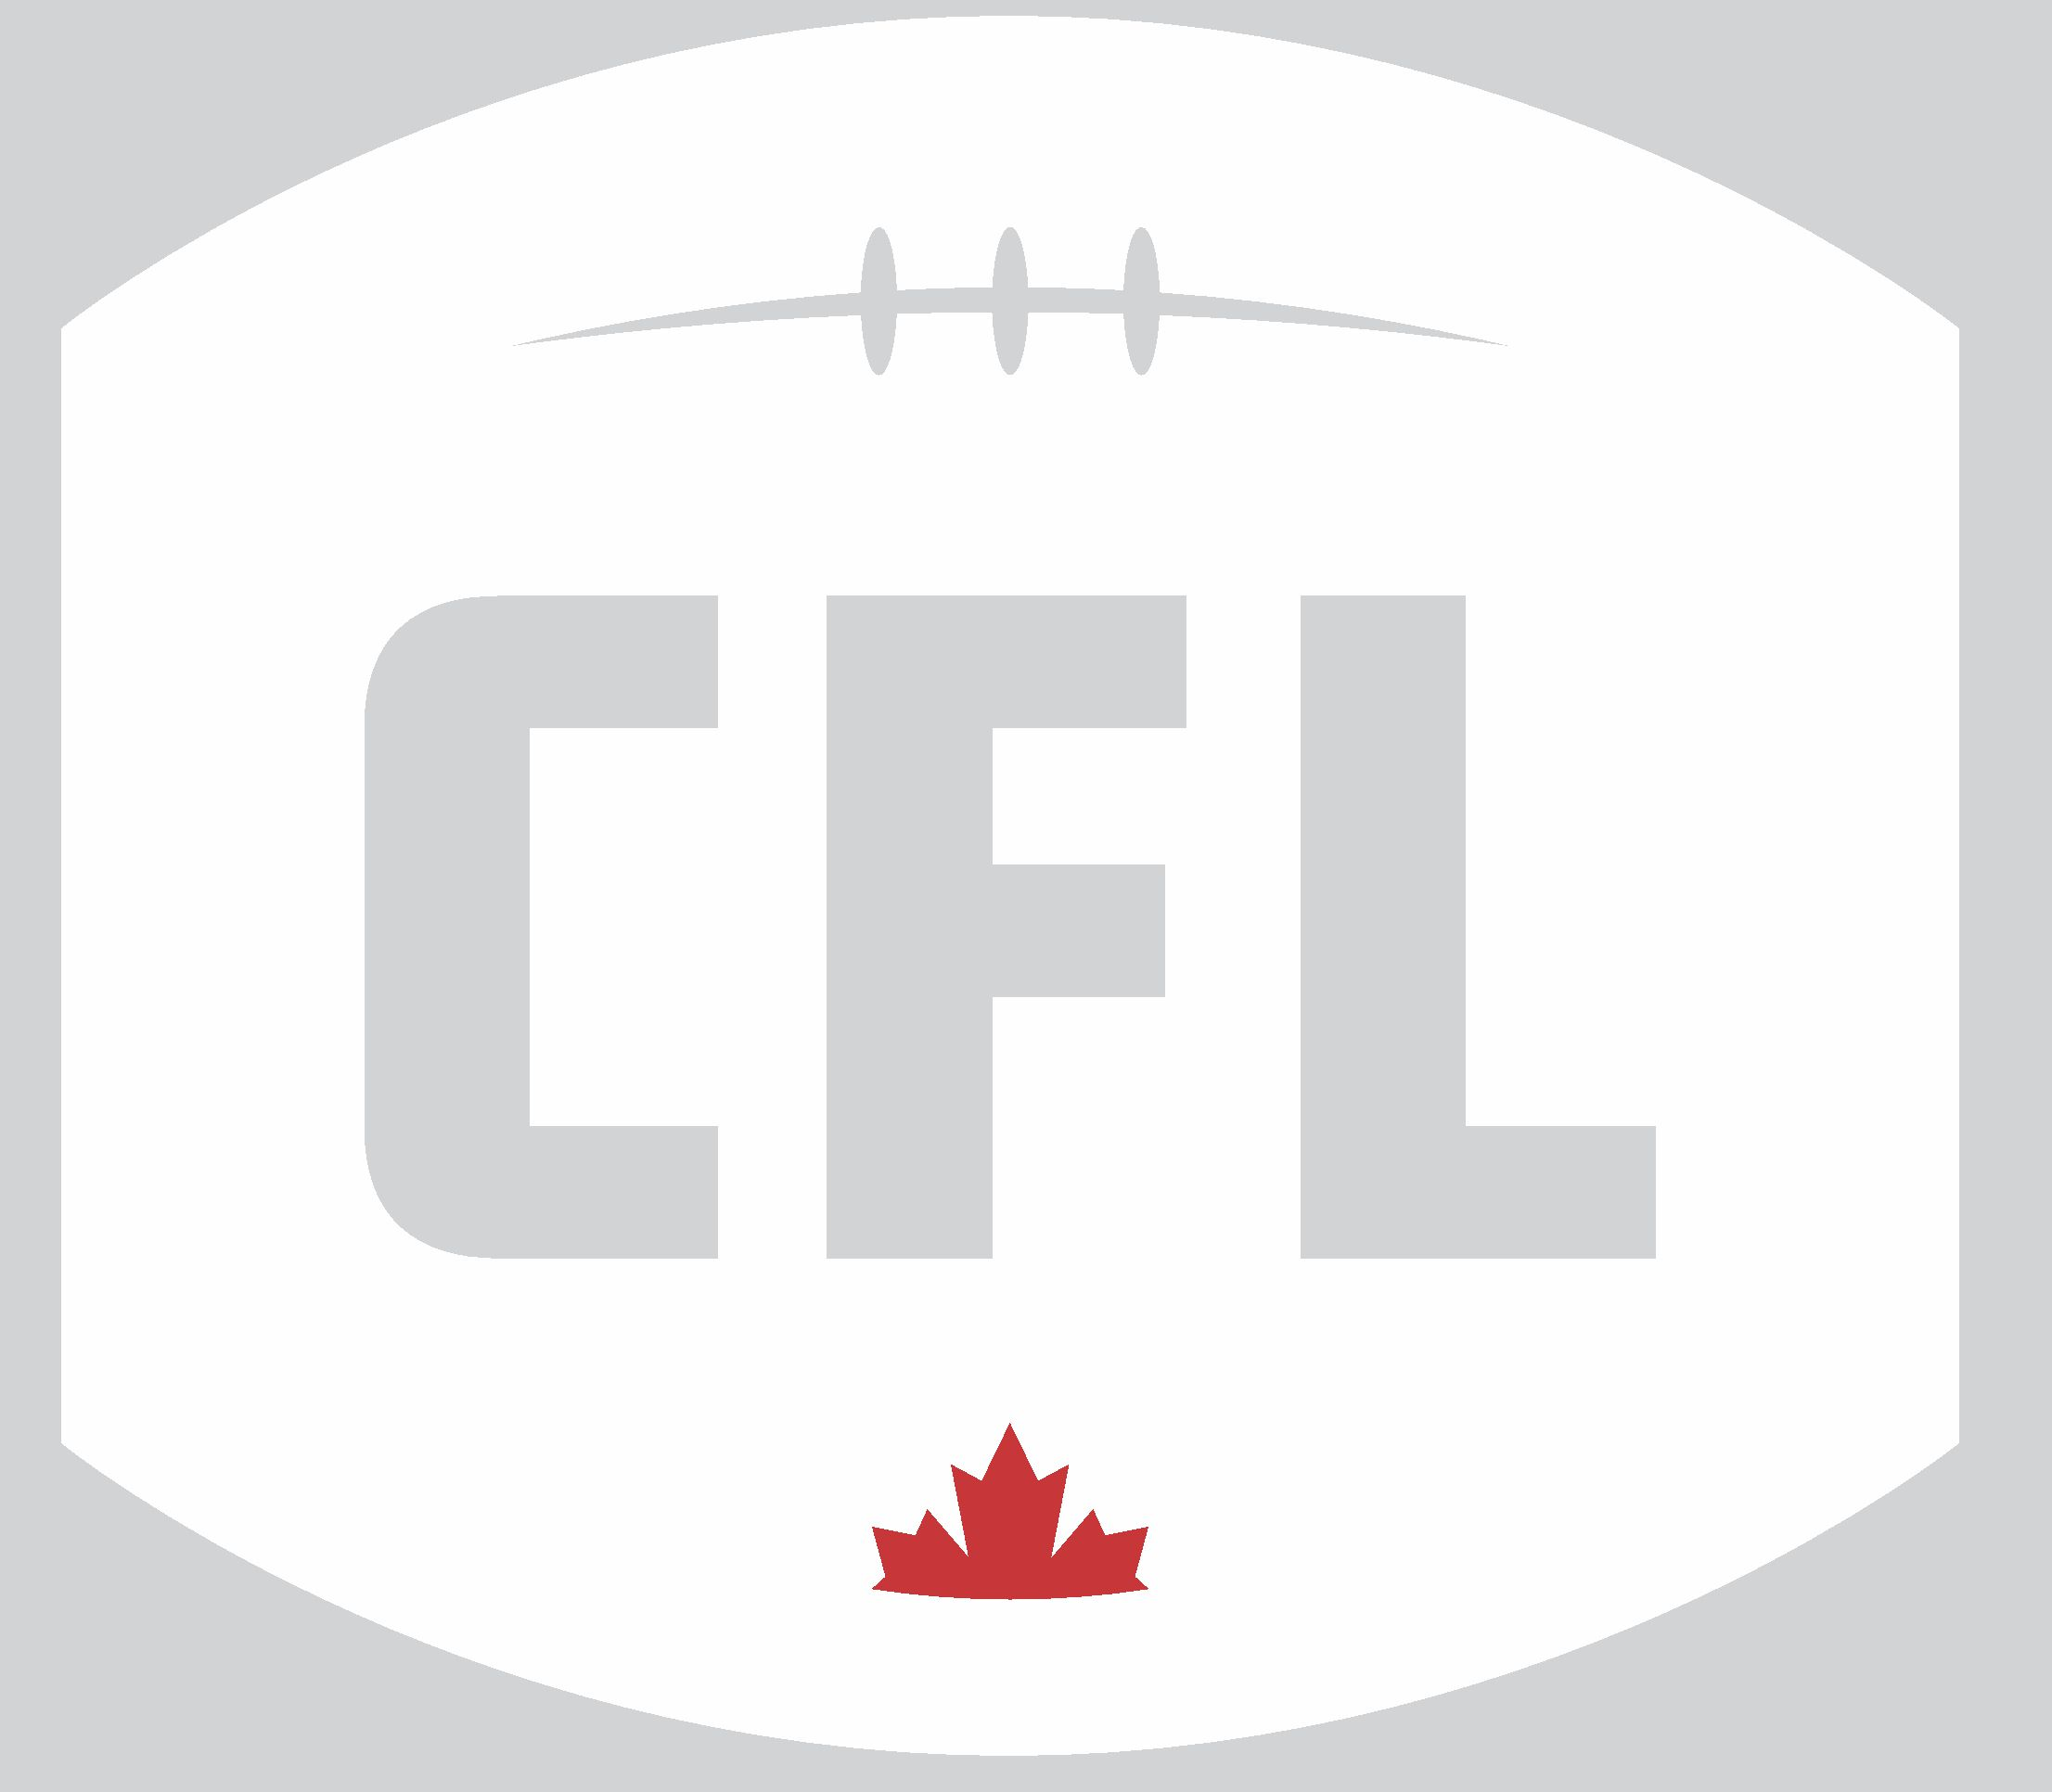 Canadian Football League logo vector